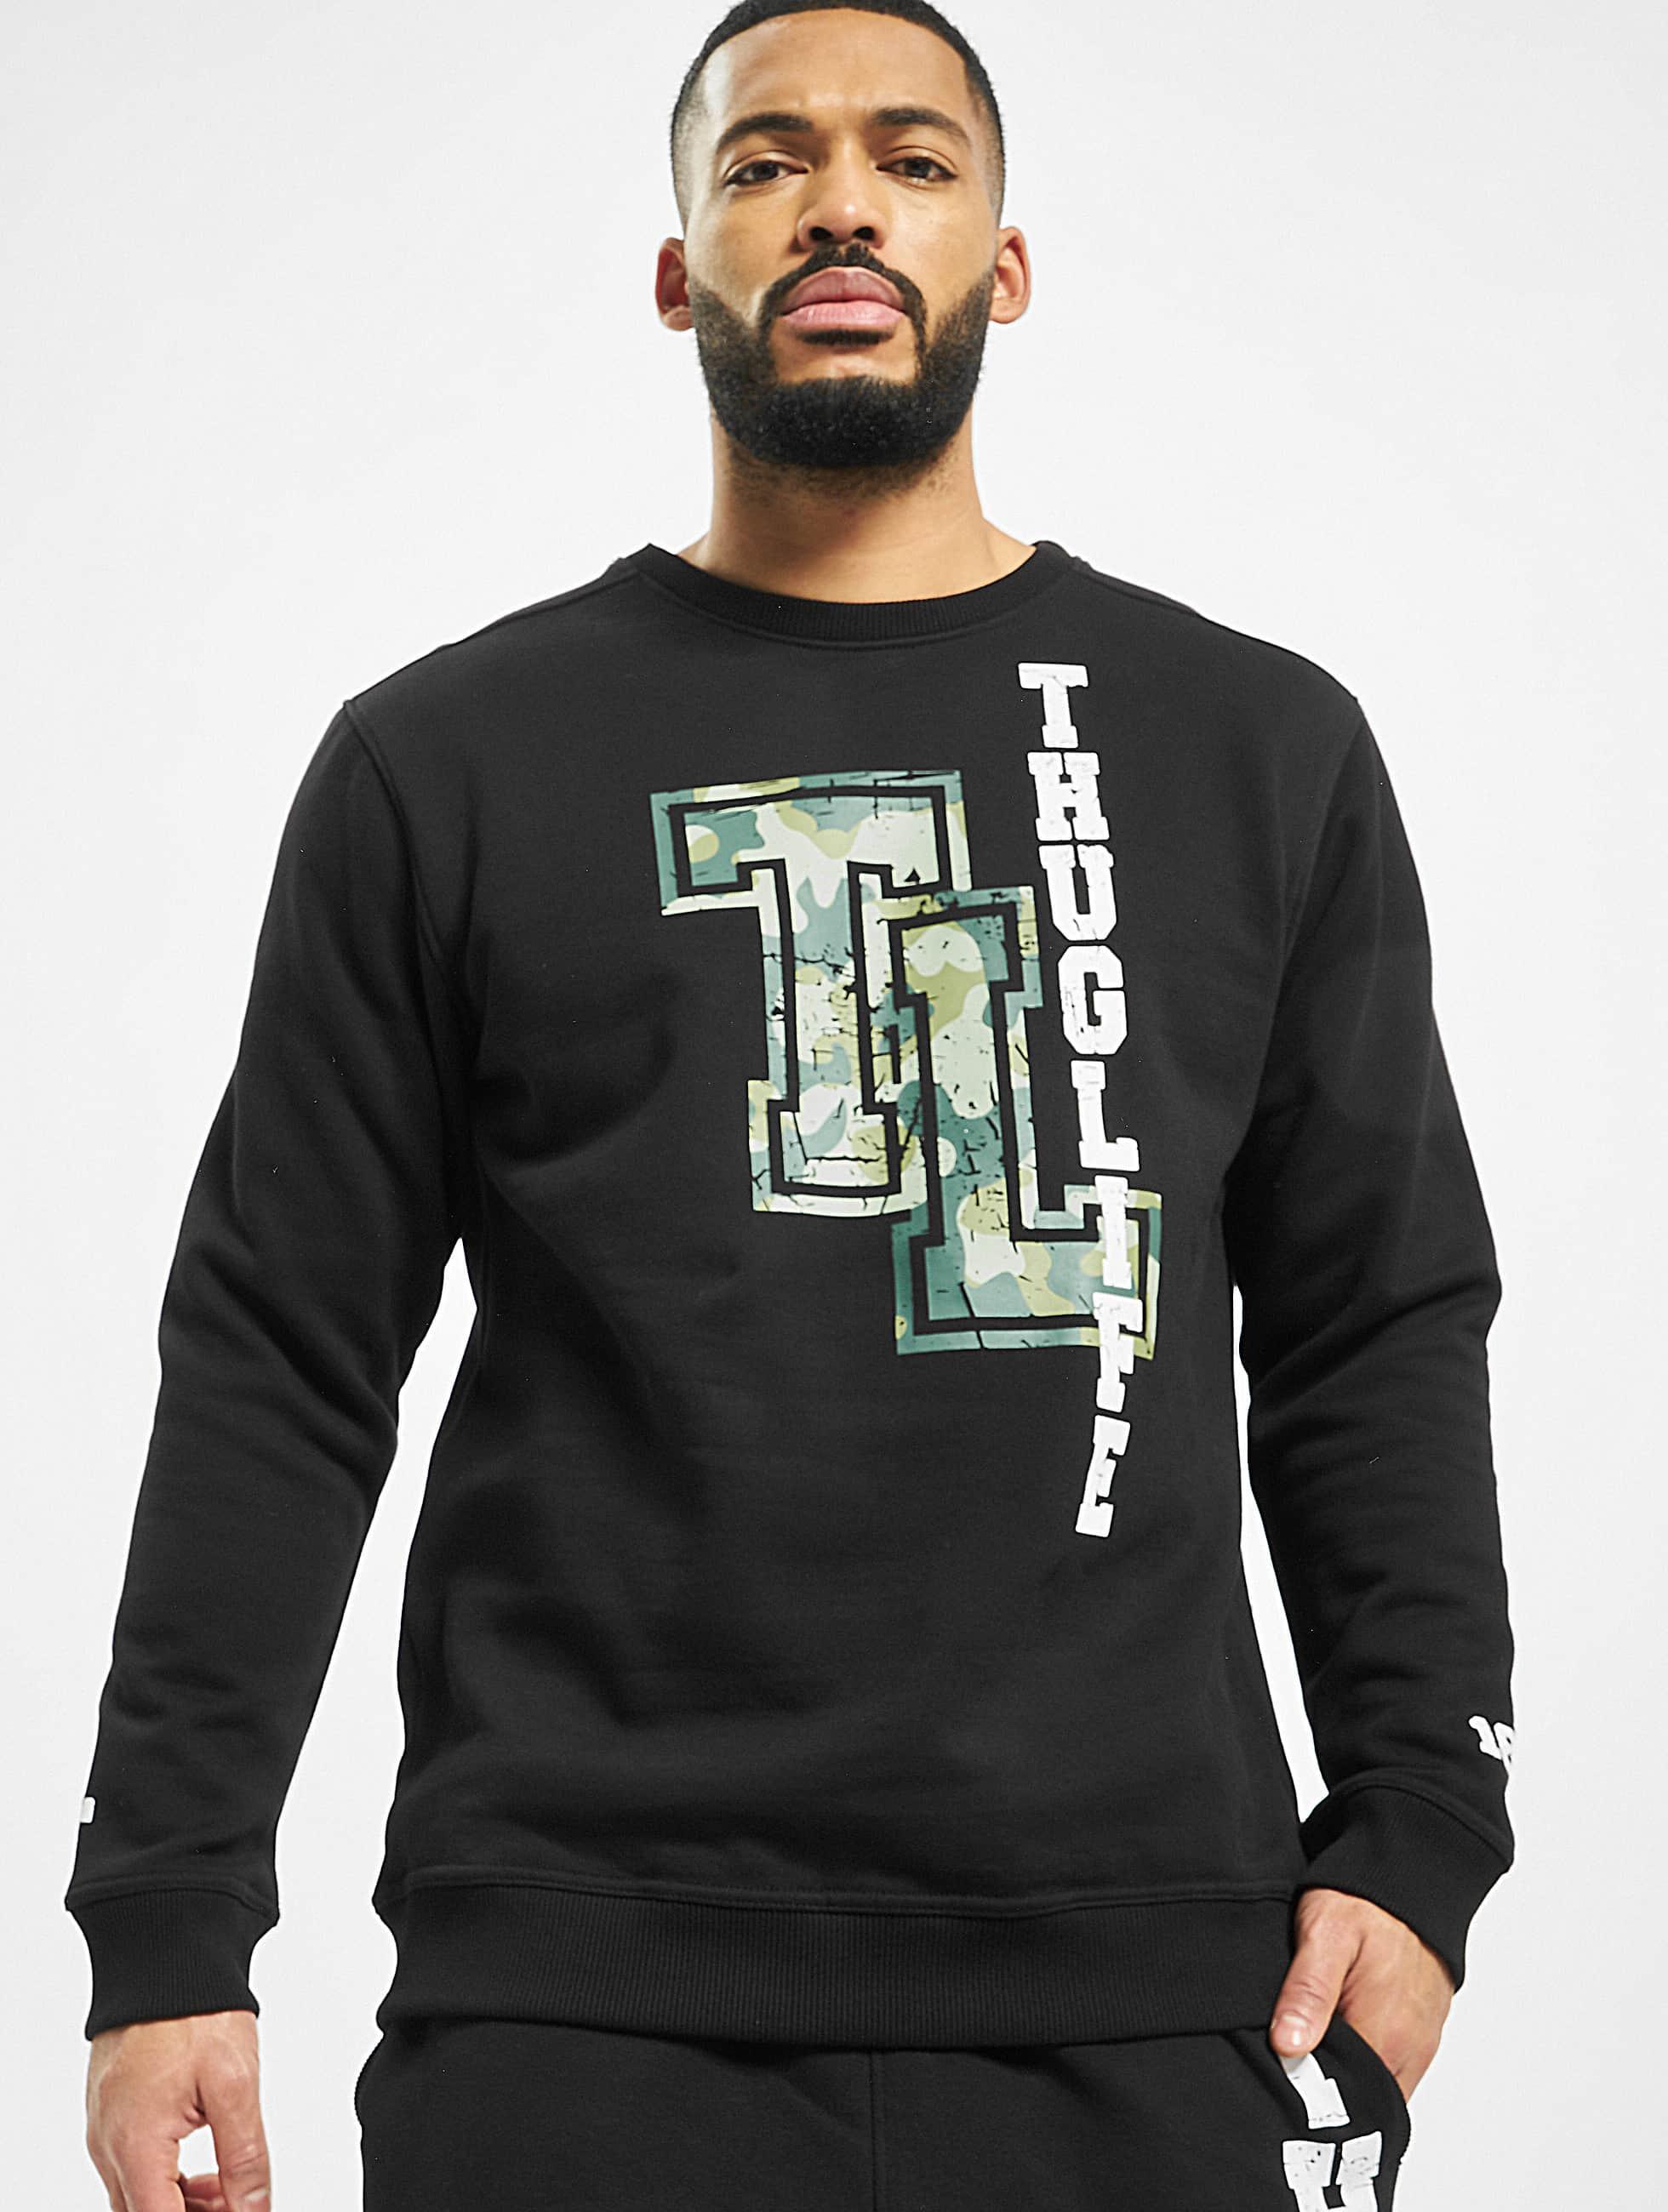 Thug Life / Jumper Under Pressure in black XL